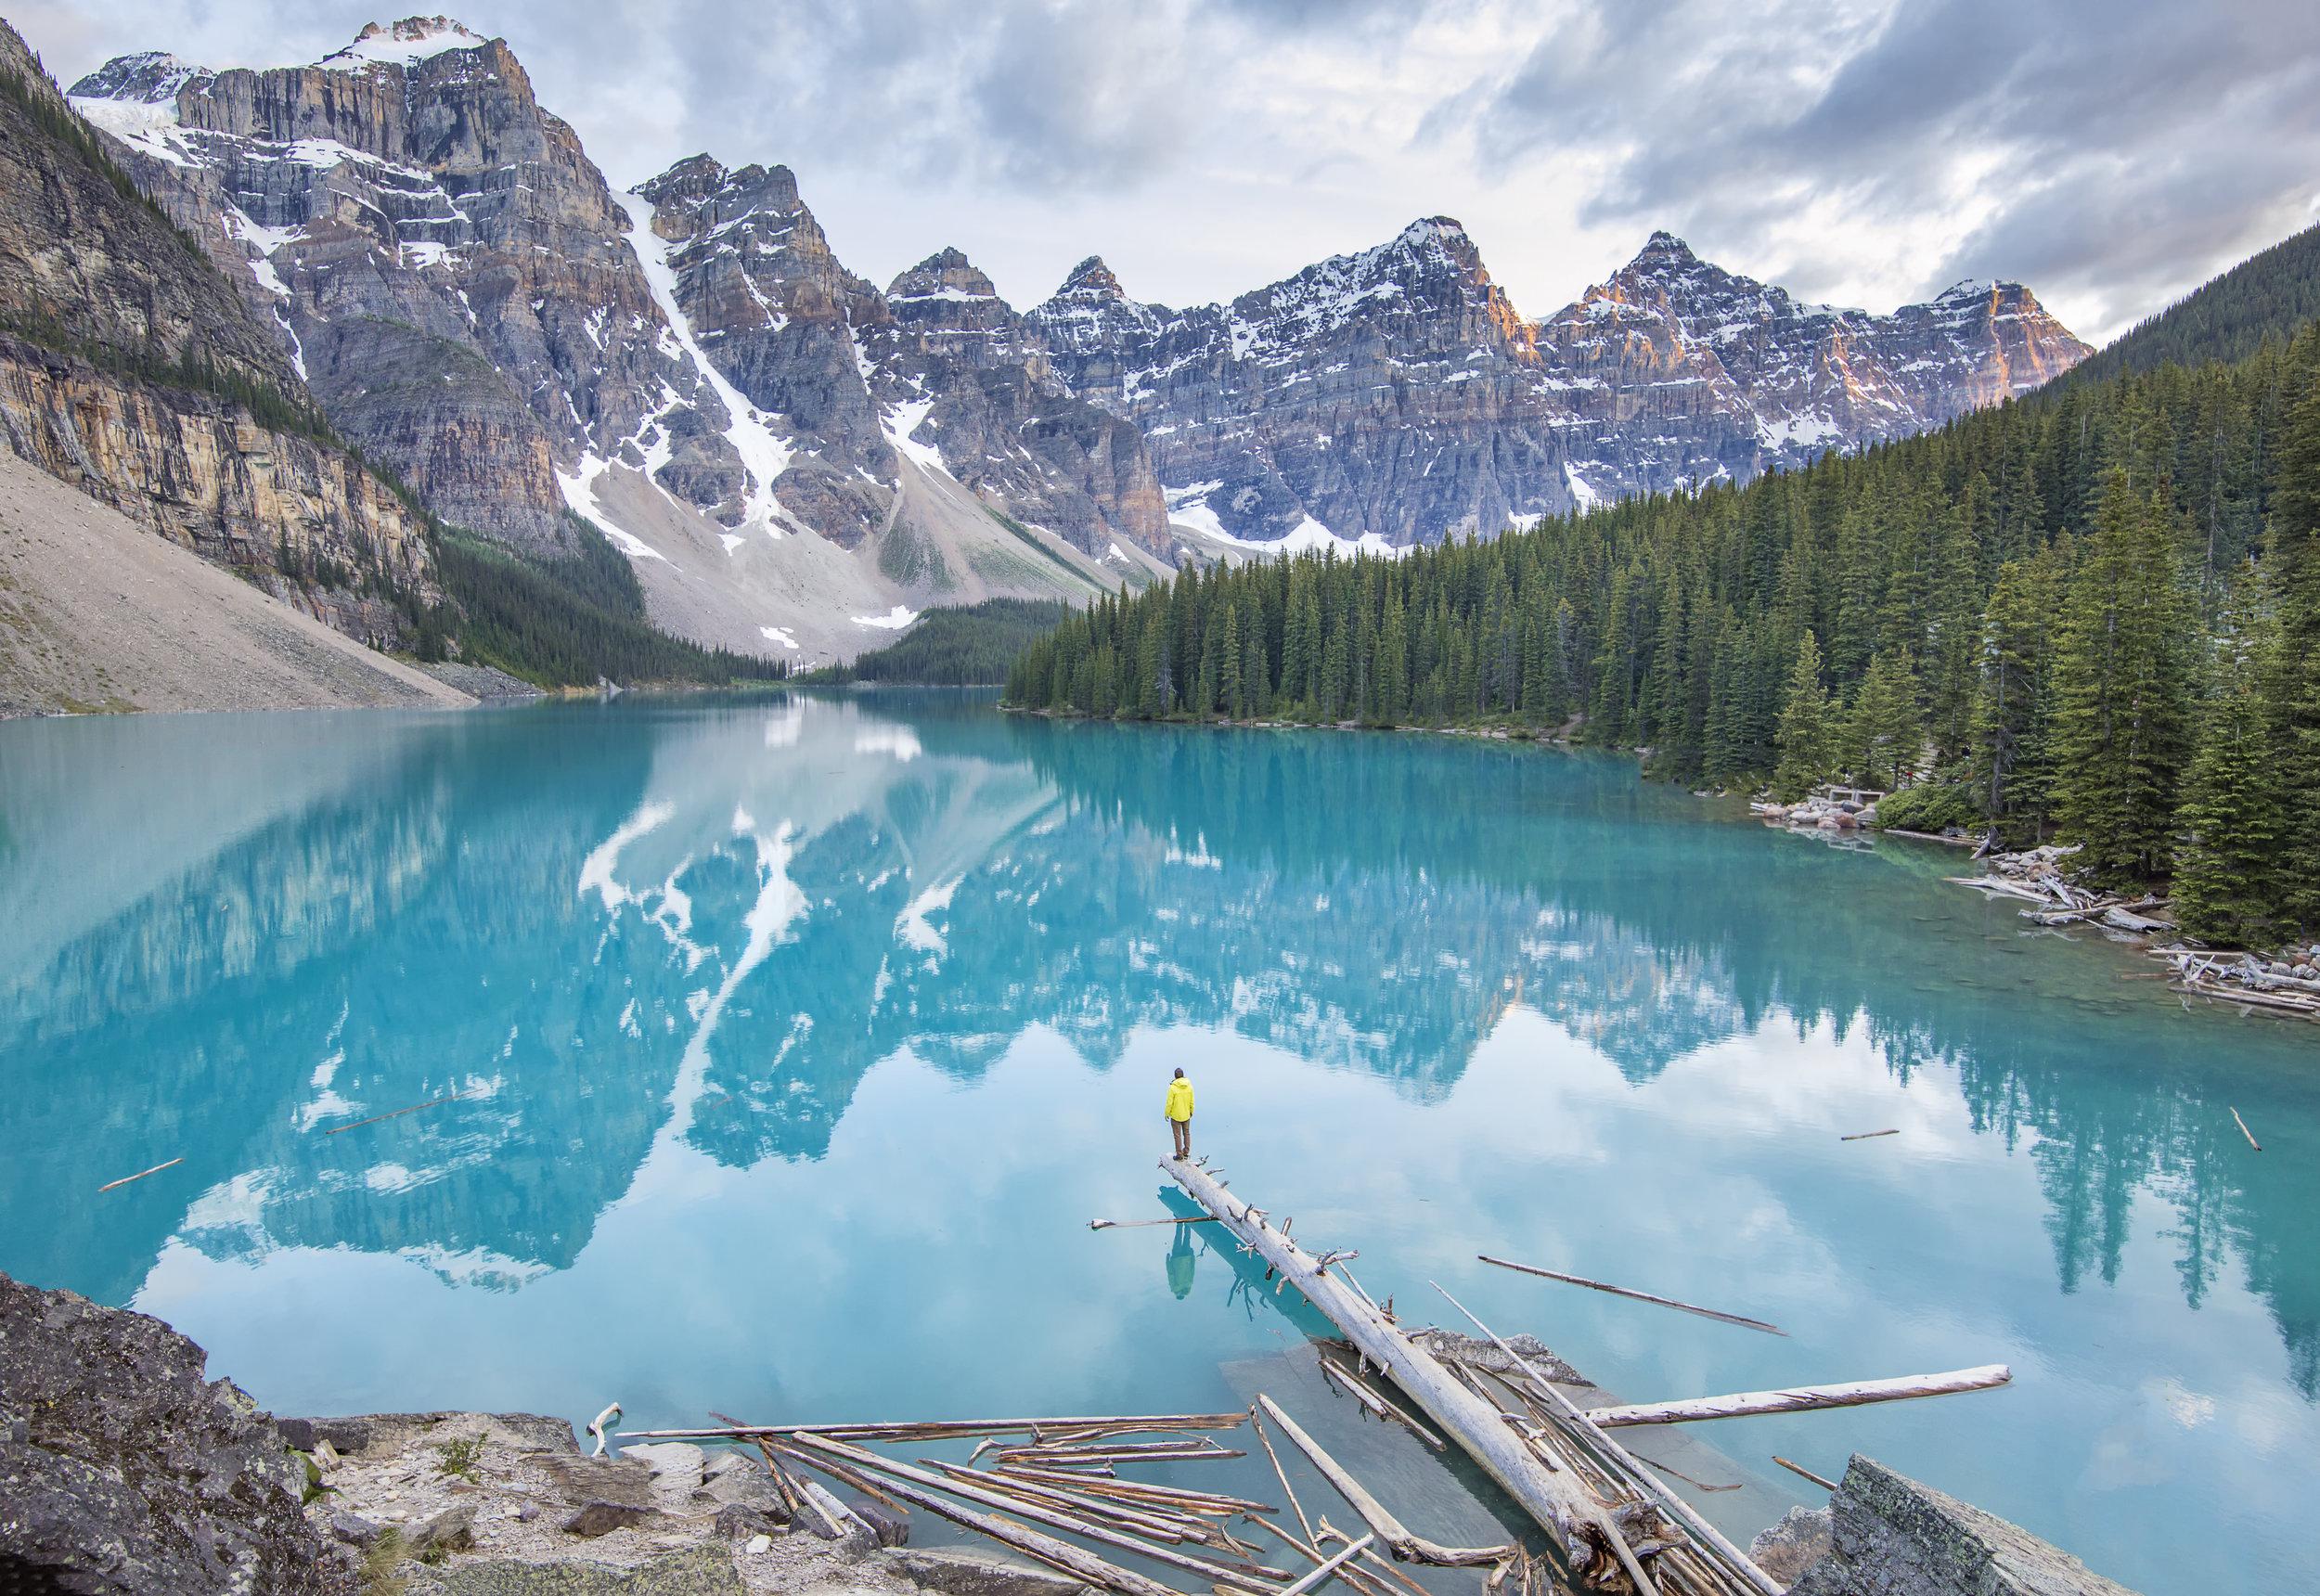 Morraine Lake, BC, Canada